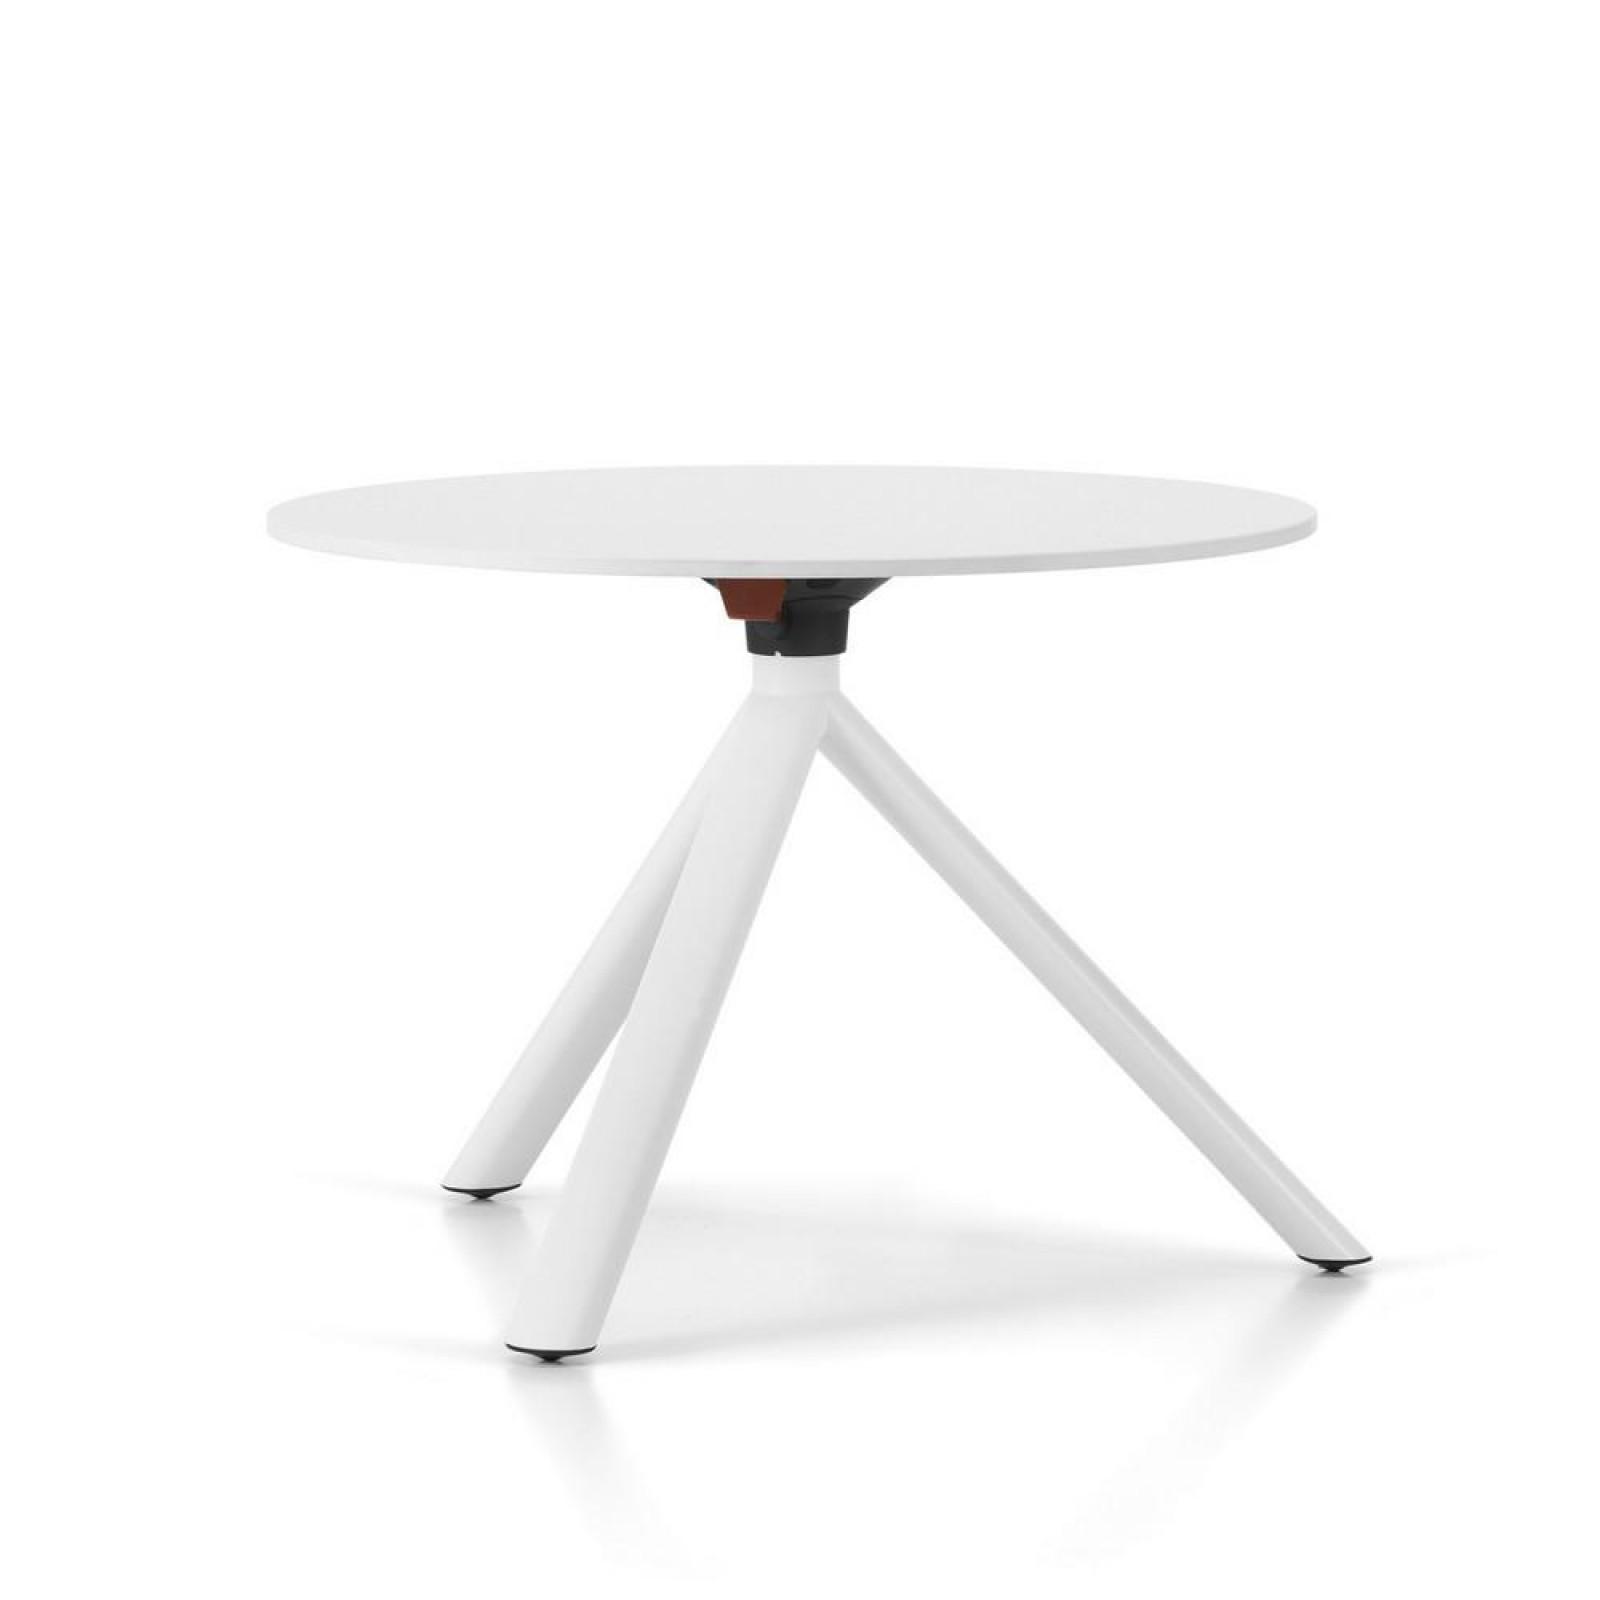 MIURA Round Coffee Table - PLANK